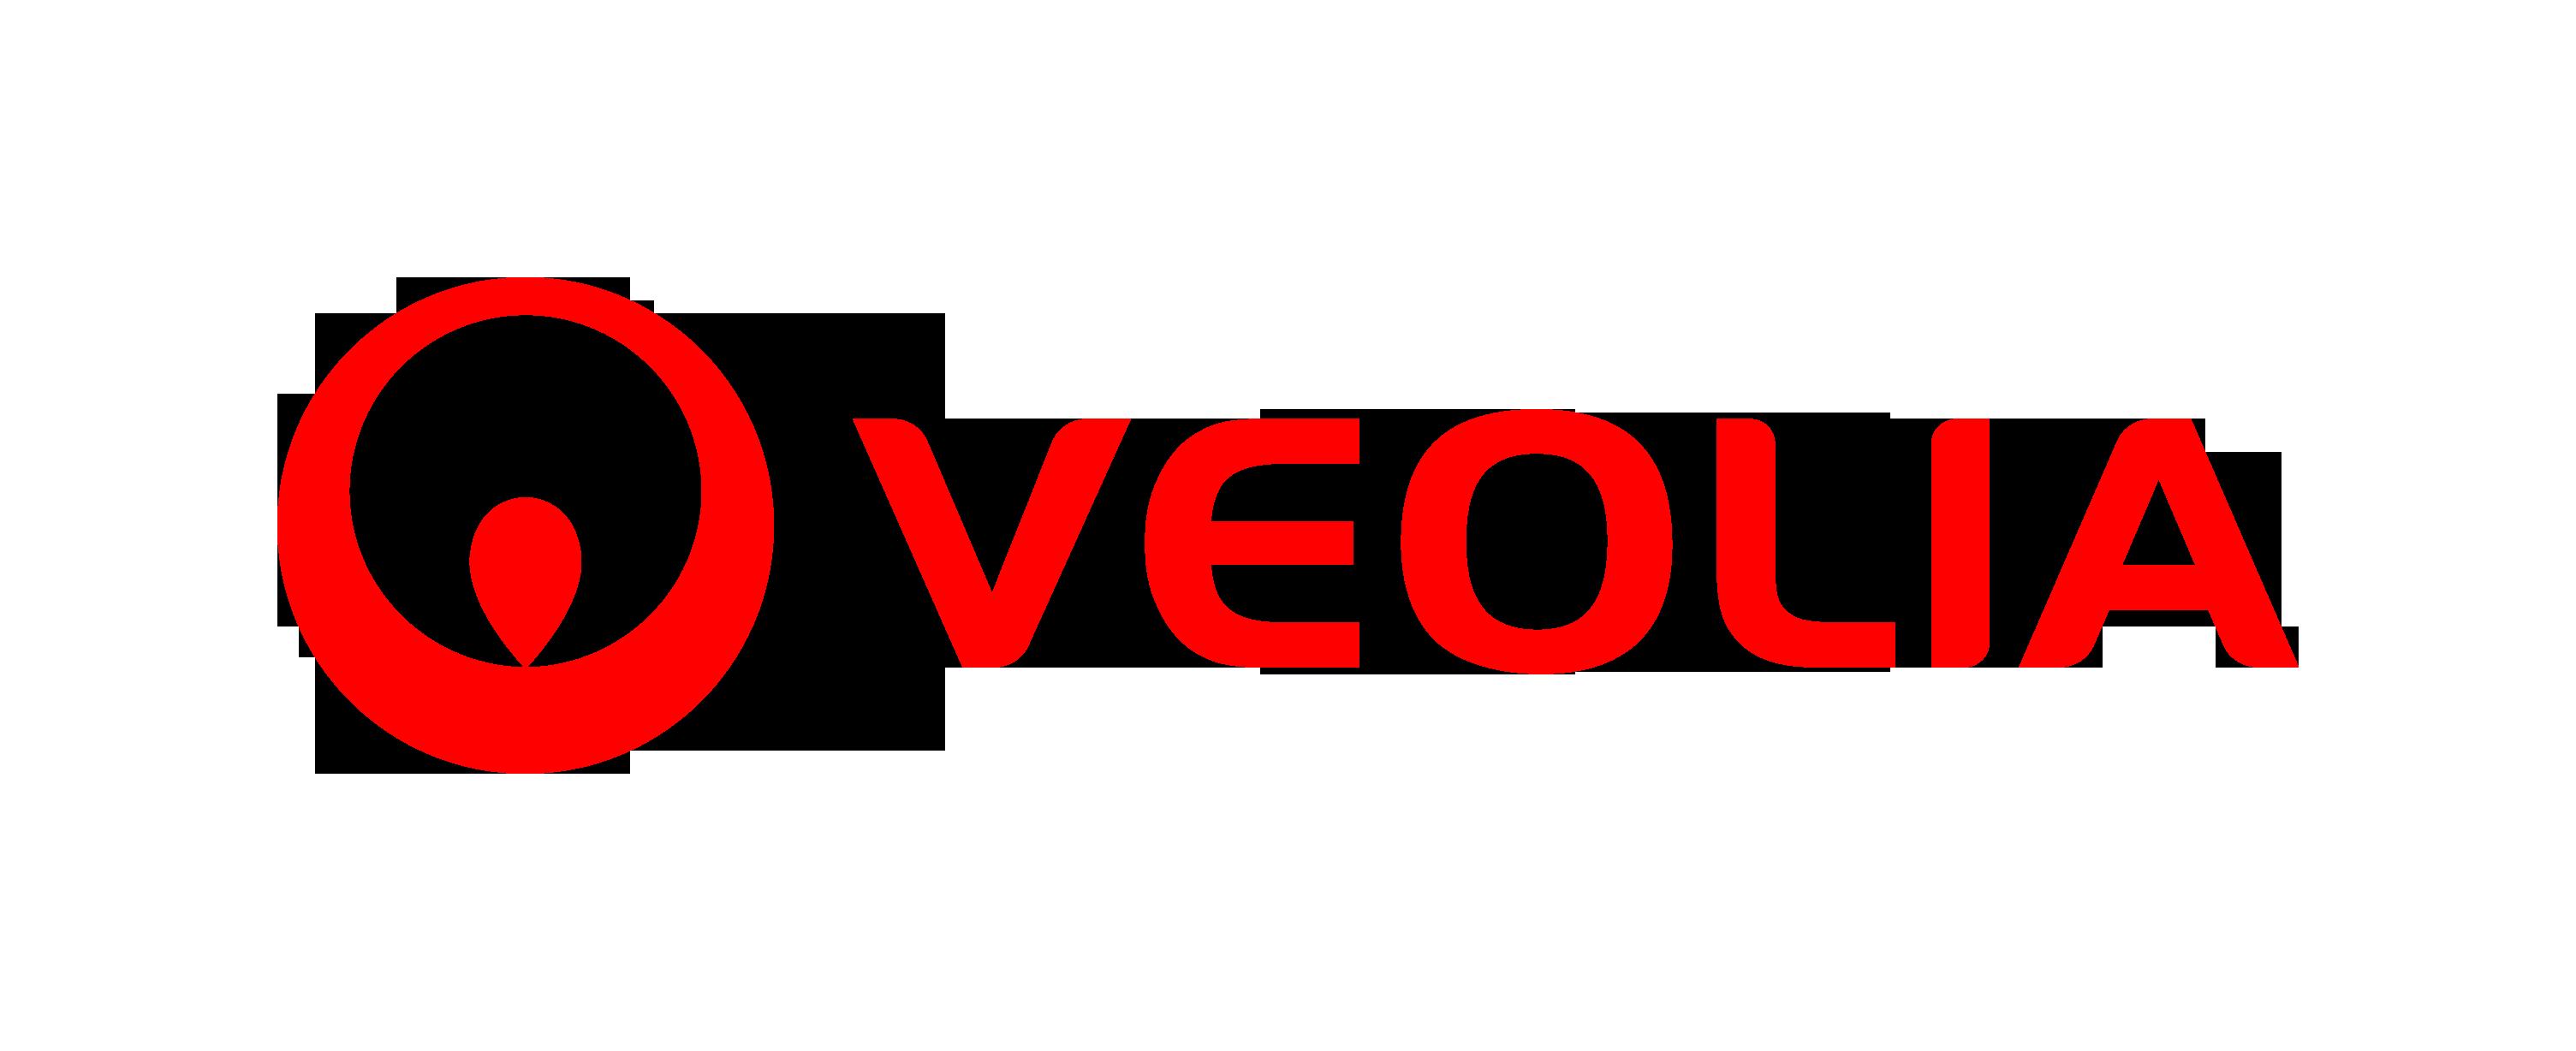 RGB_VEOLIA_HD